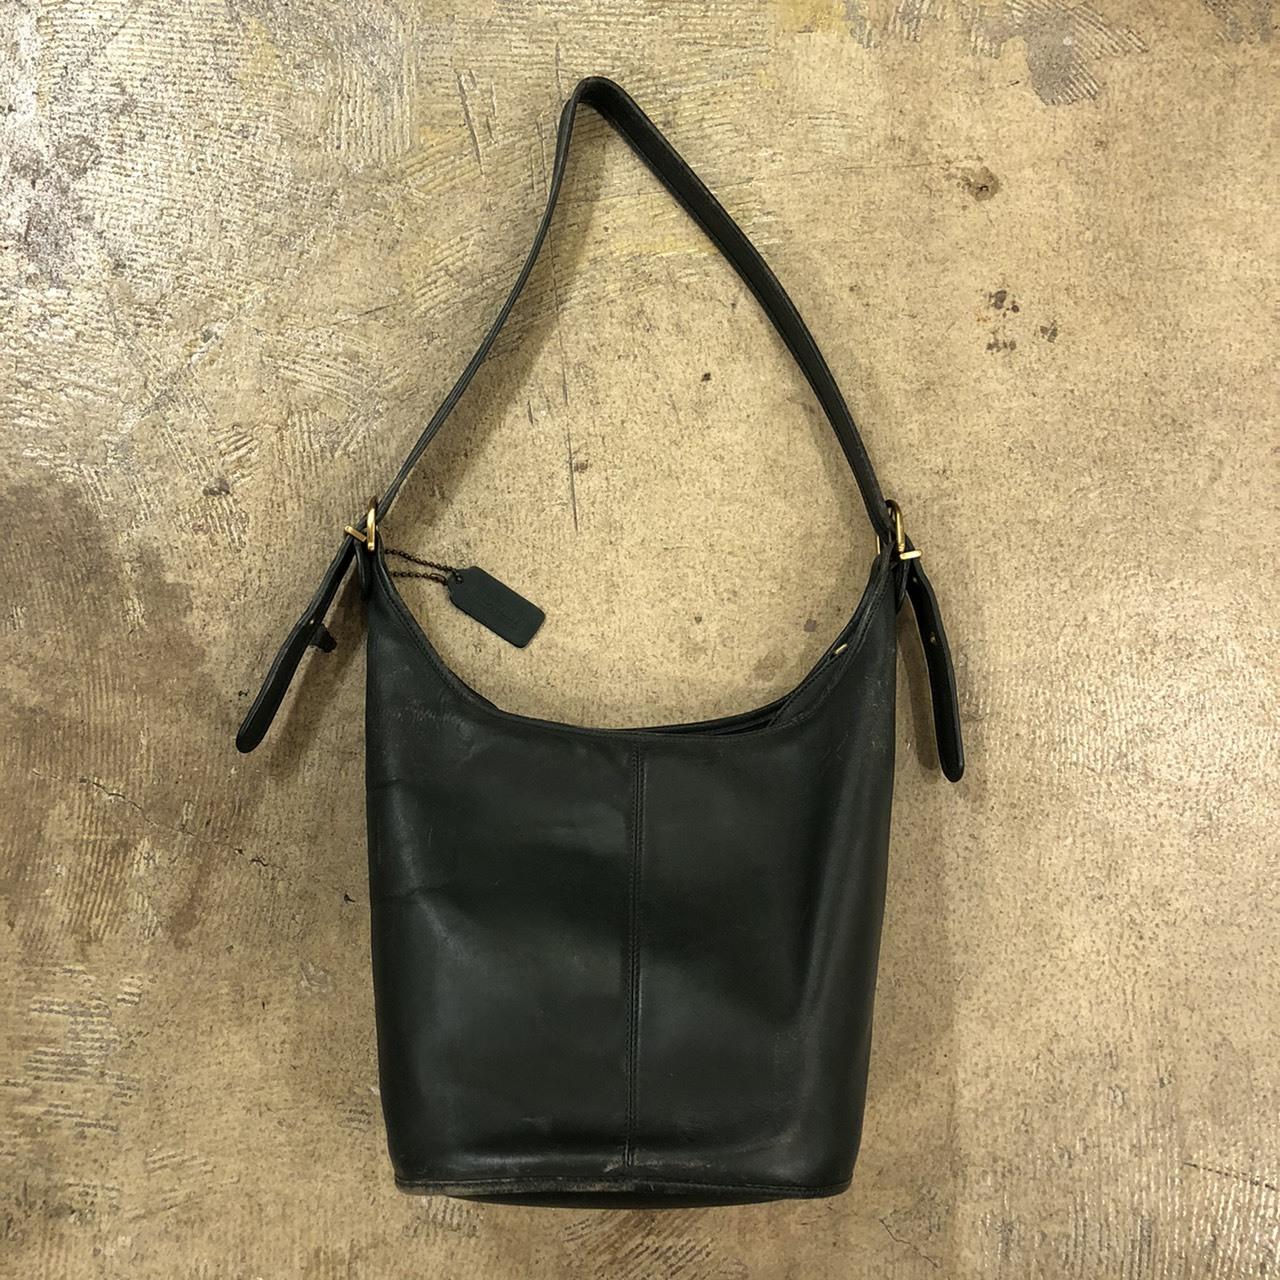 OLD COACH #Shoulder Bag Green ¥6,900+tax